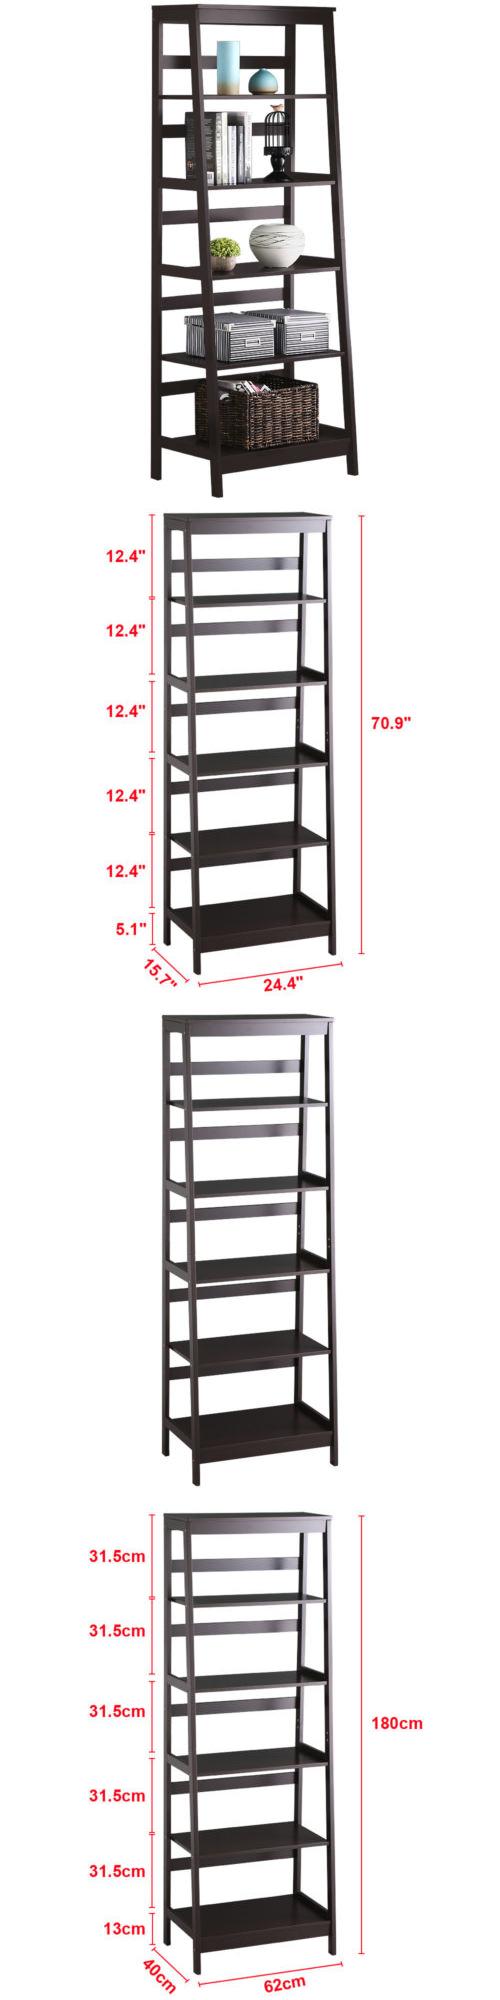 Bookcases tier bookcase bookshelf leaning wall shelf ladder